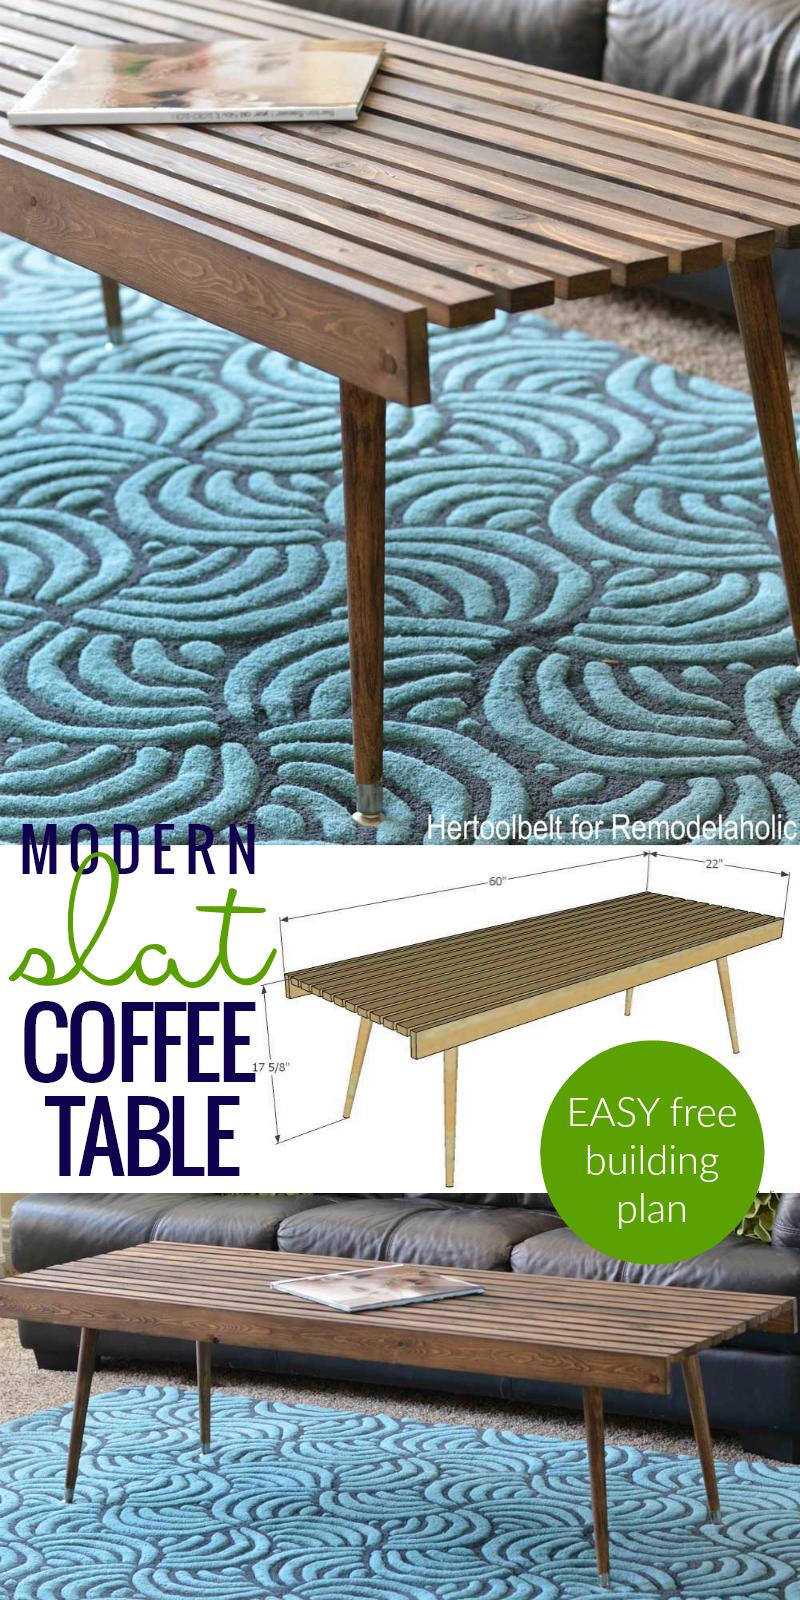 Free building plan easy modern slat coffee table or bench for free building plan easy modern slat coffee table or bench for under 50 no geotapseo Images